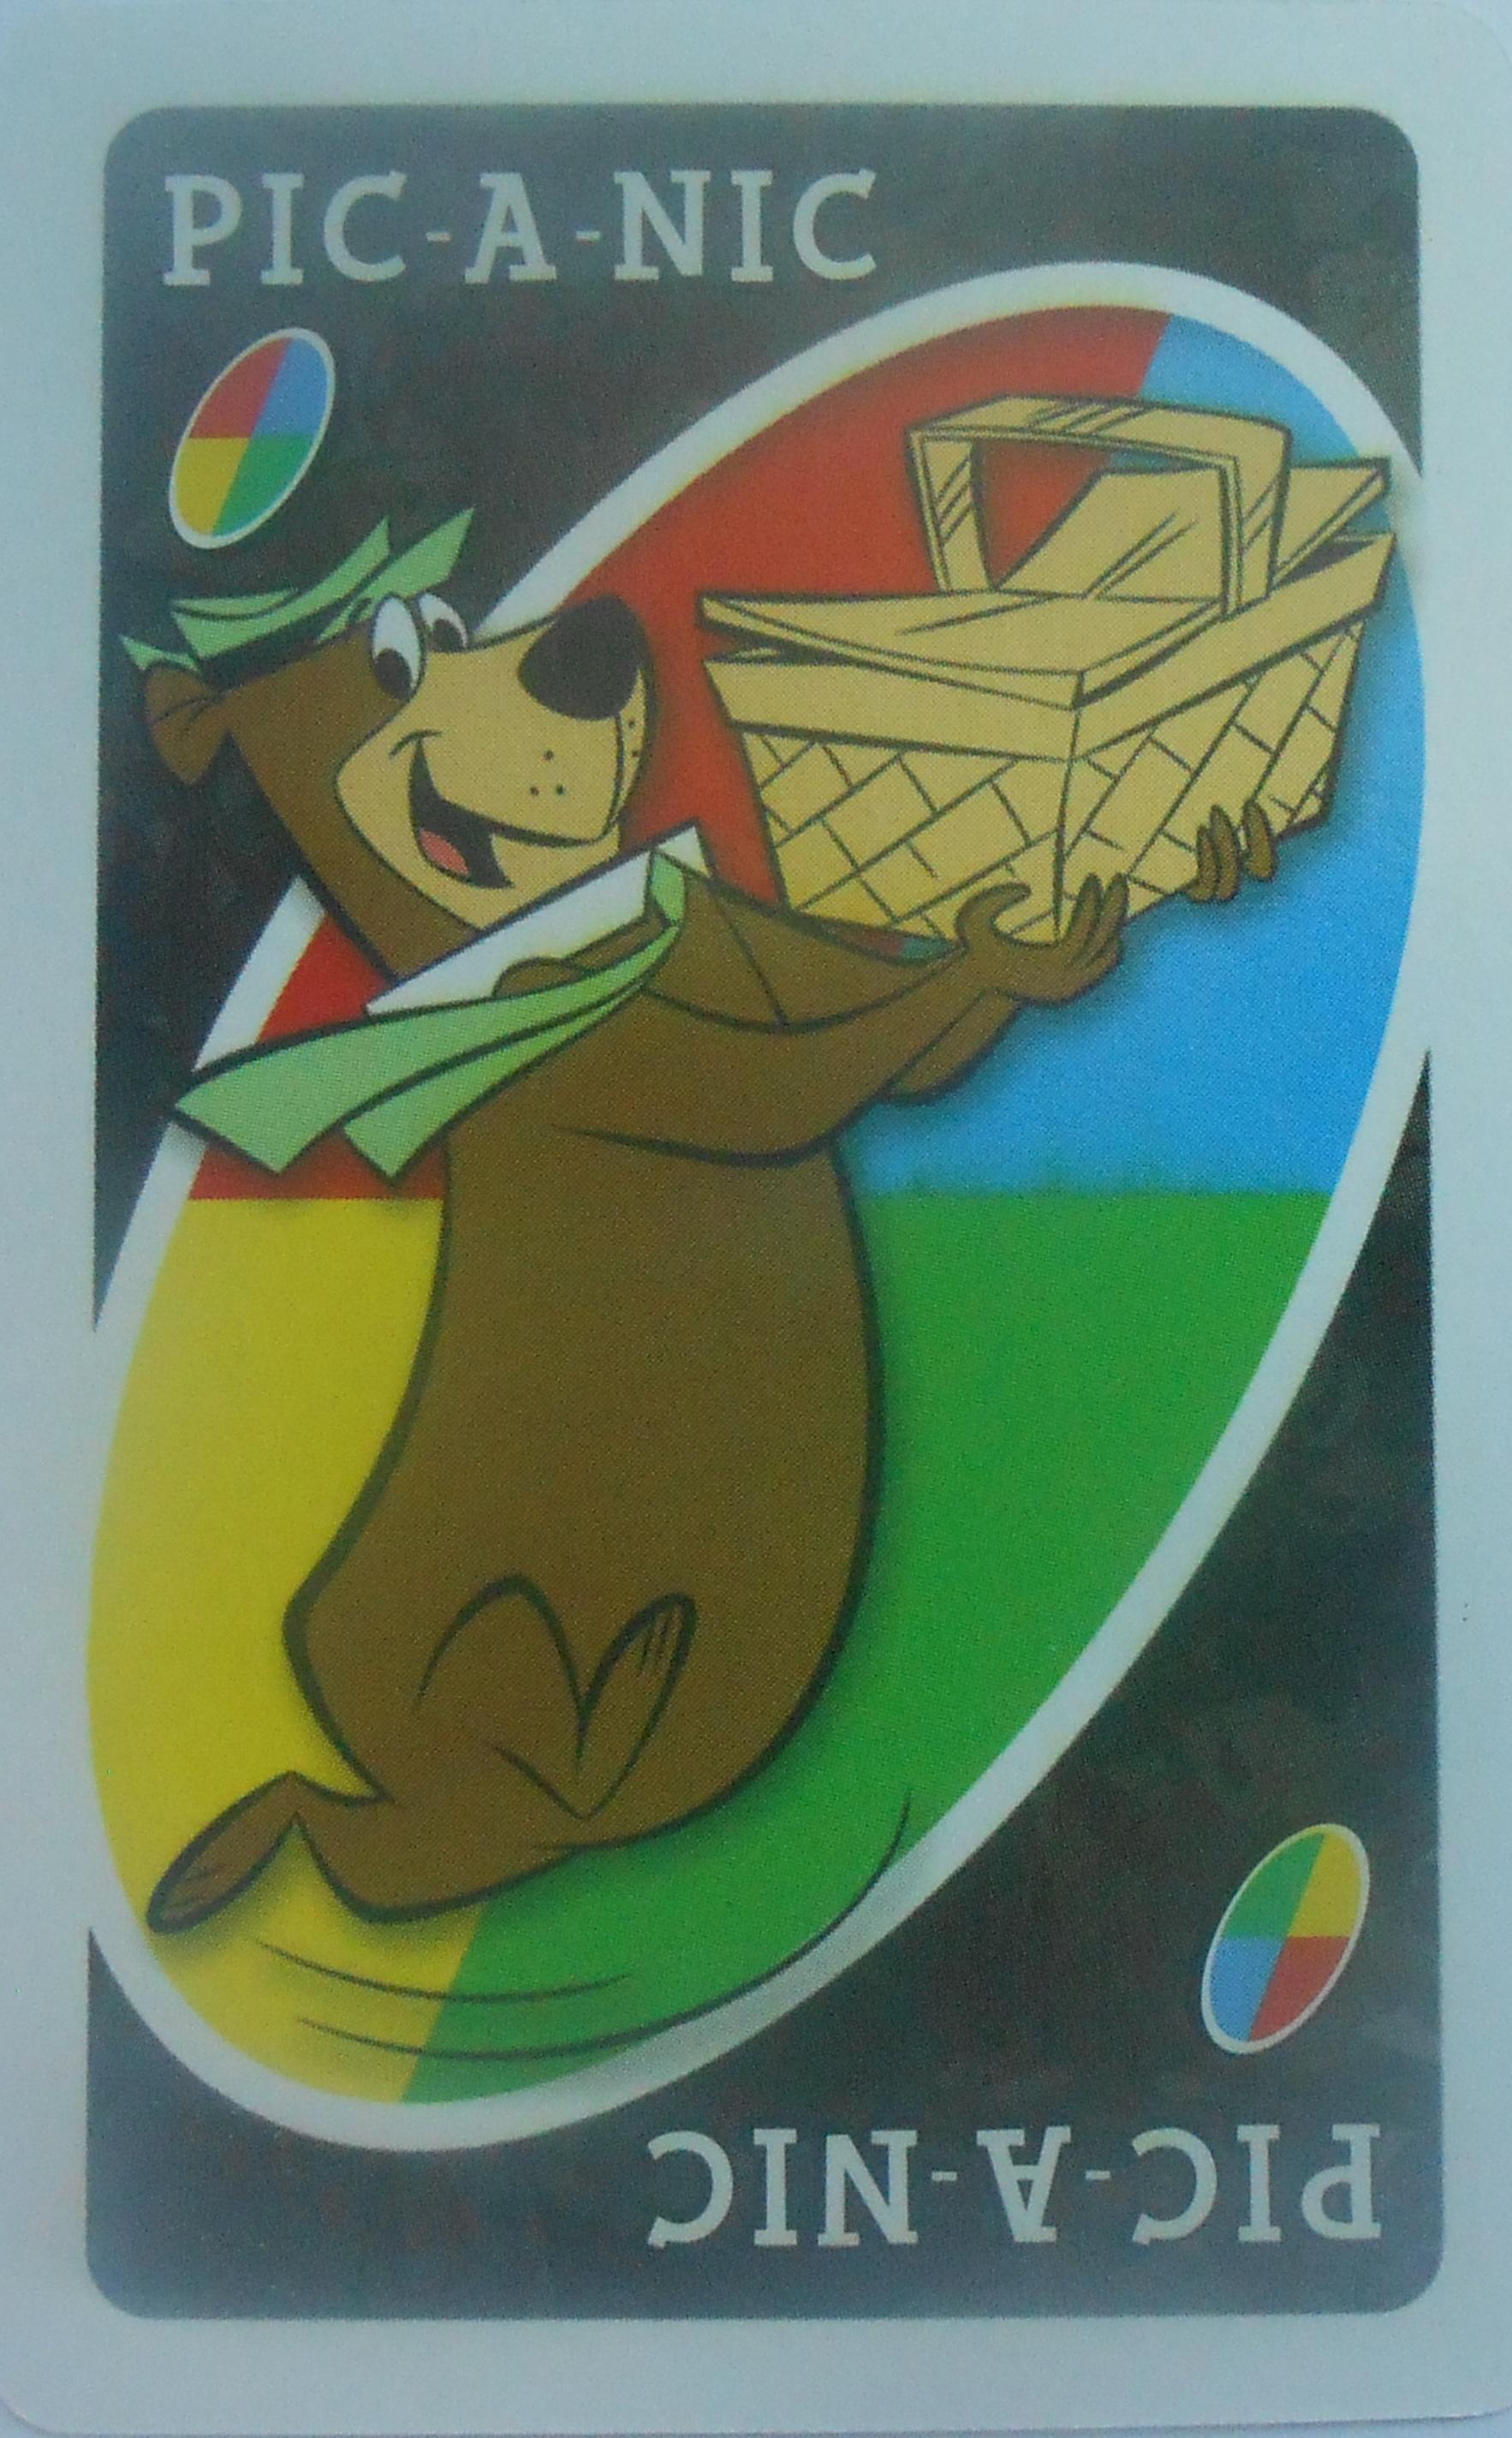 Hanna Barbera Uno (PIC-A-NIC Card)